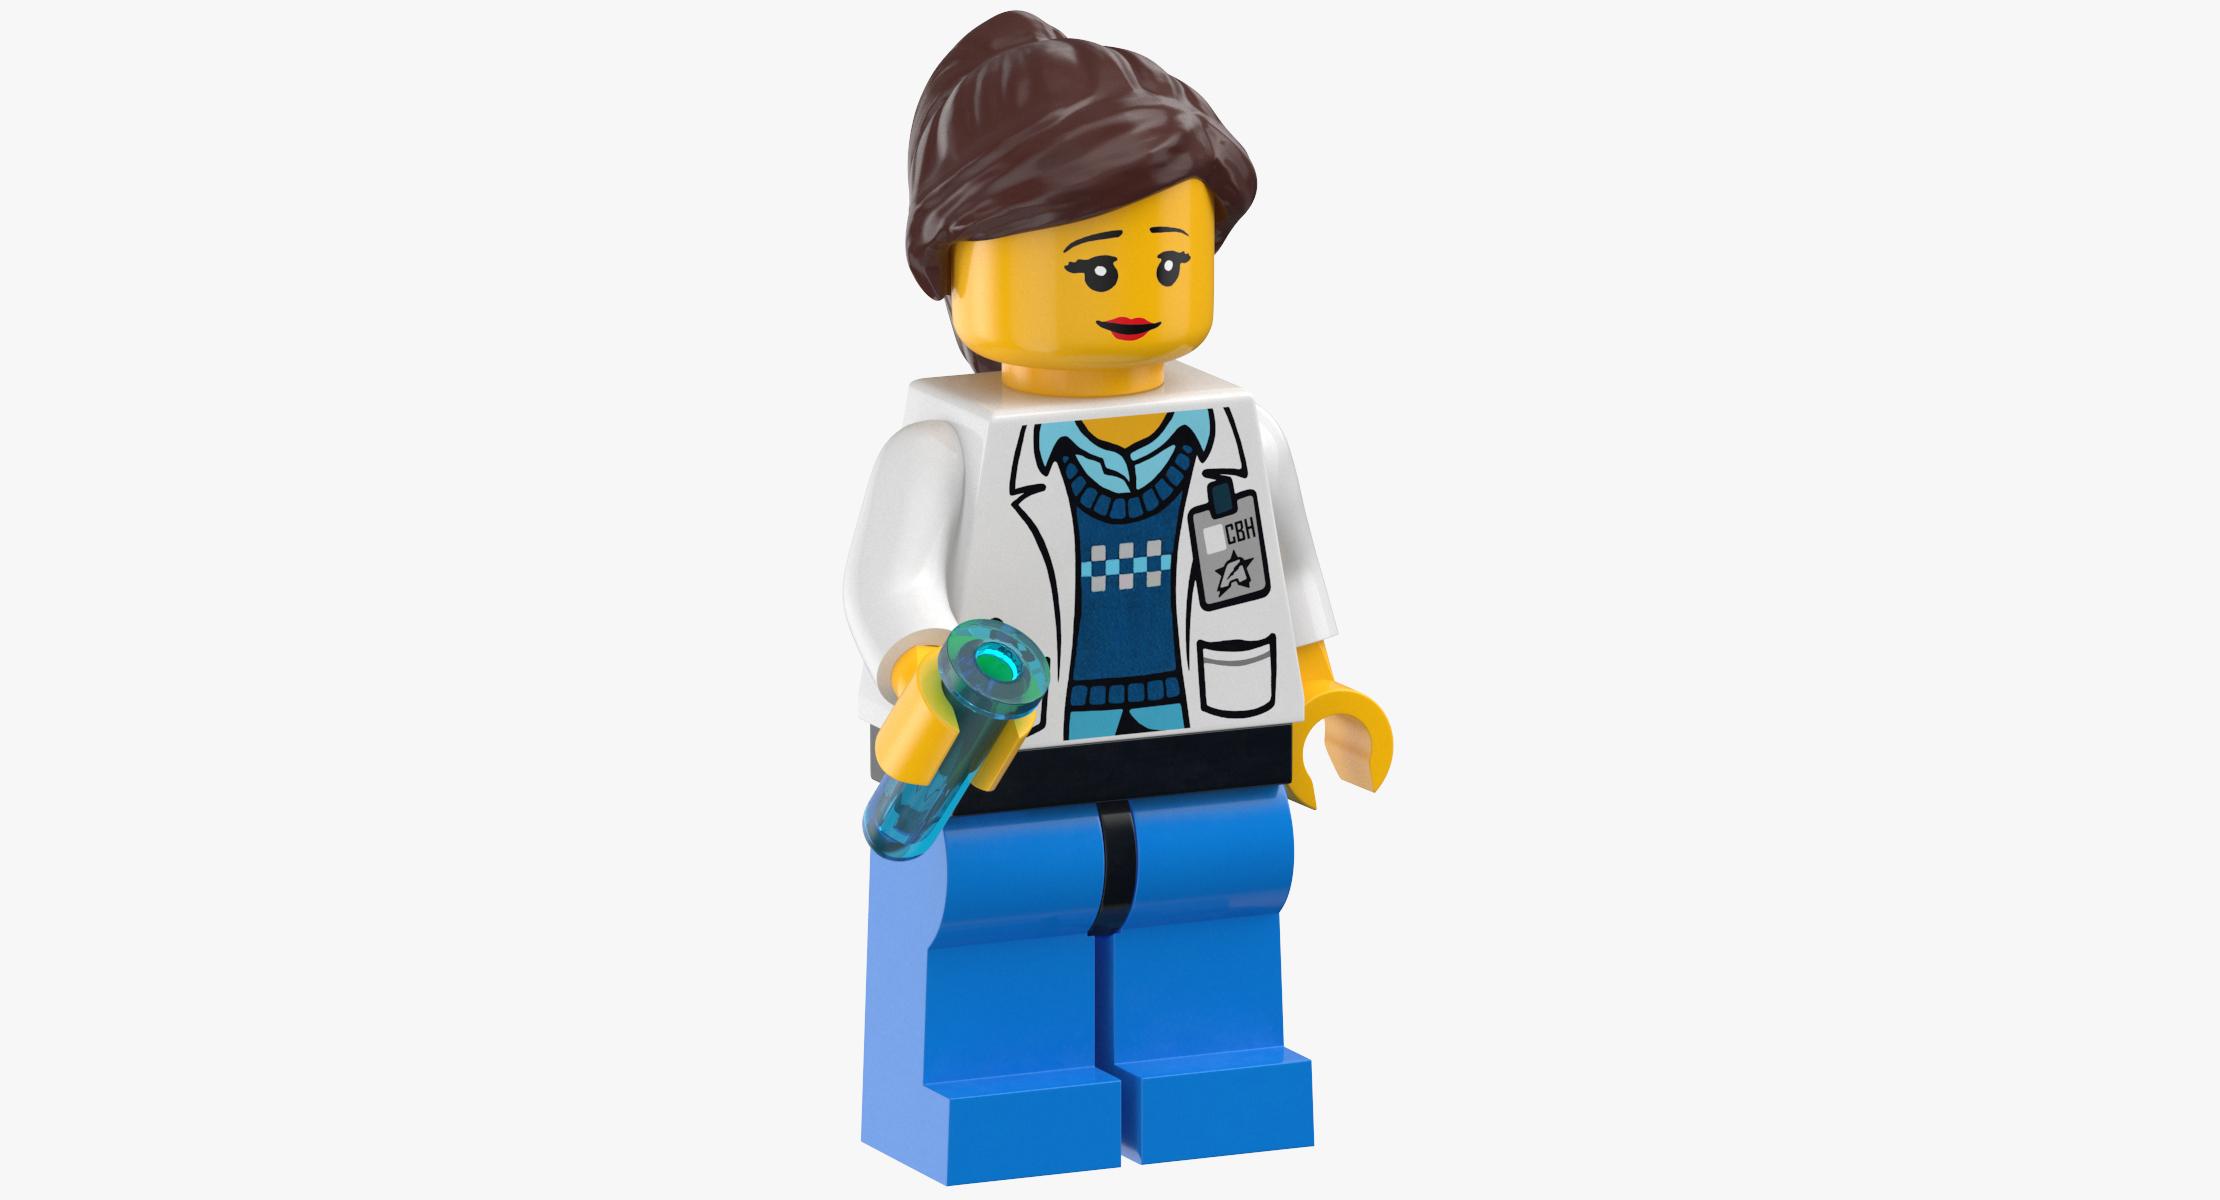 LEGO Woman in Striped Shirt Minifigure   Brick Owl - LEGO